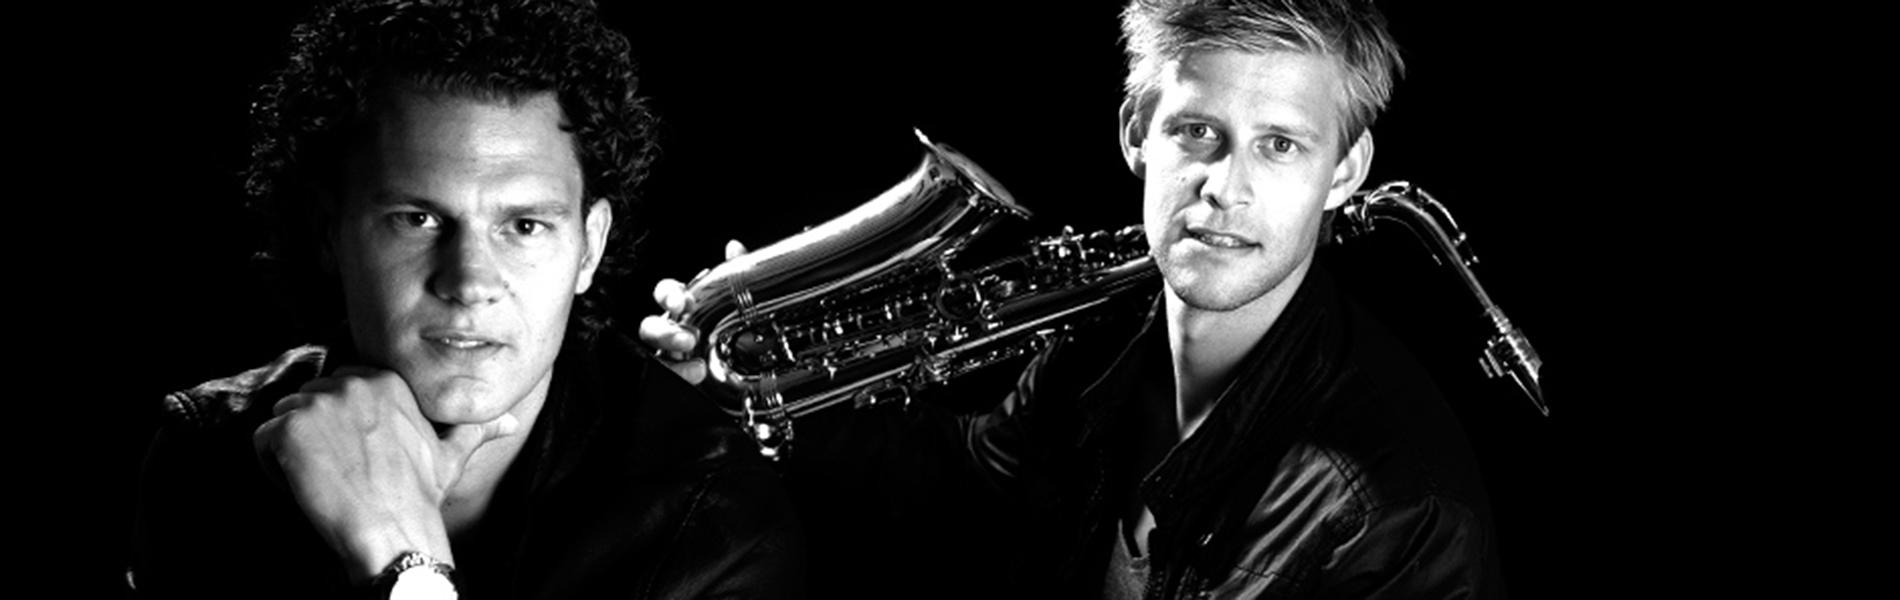 Wayland and Falco on sax header 1